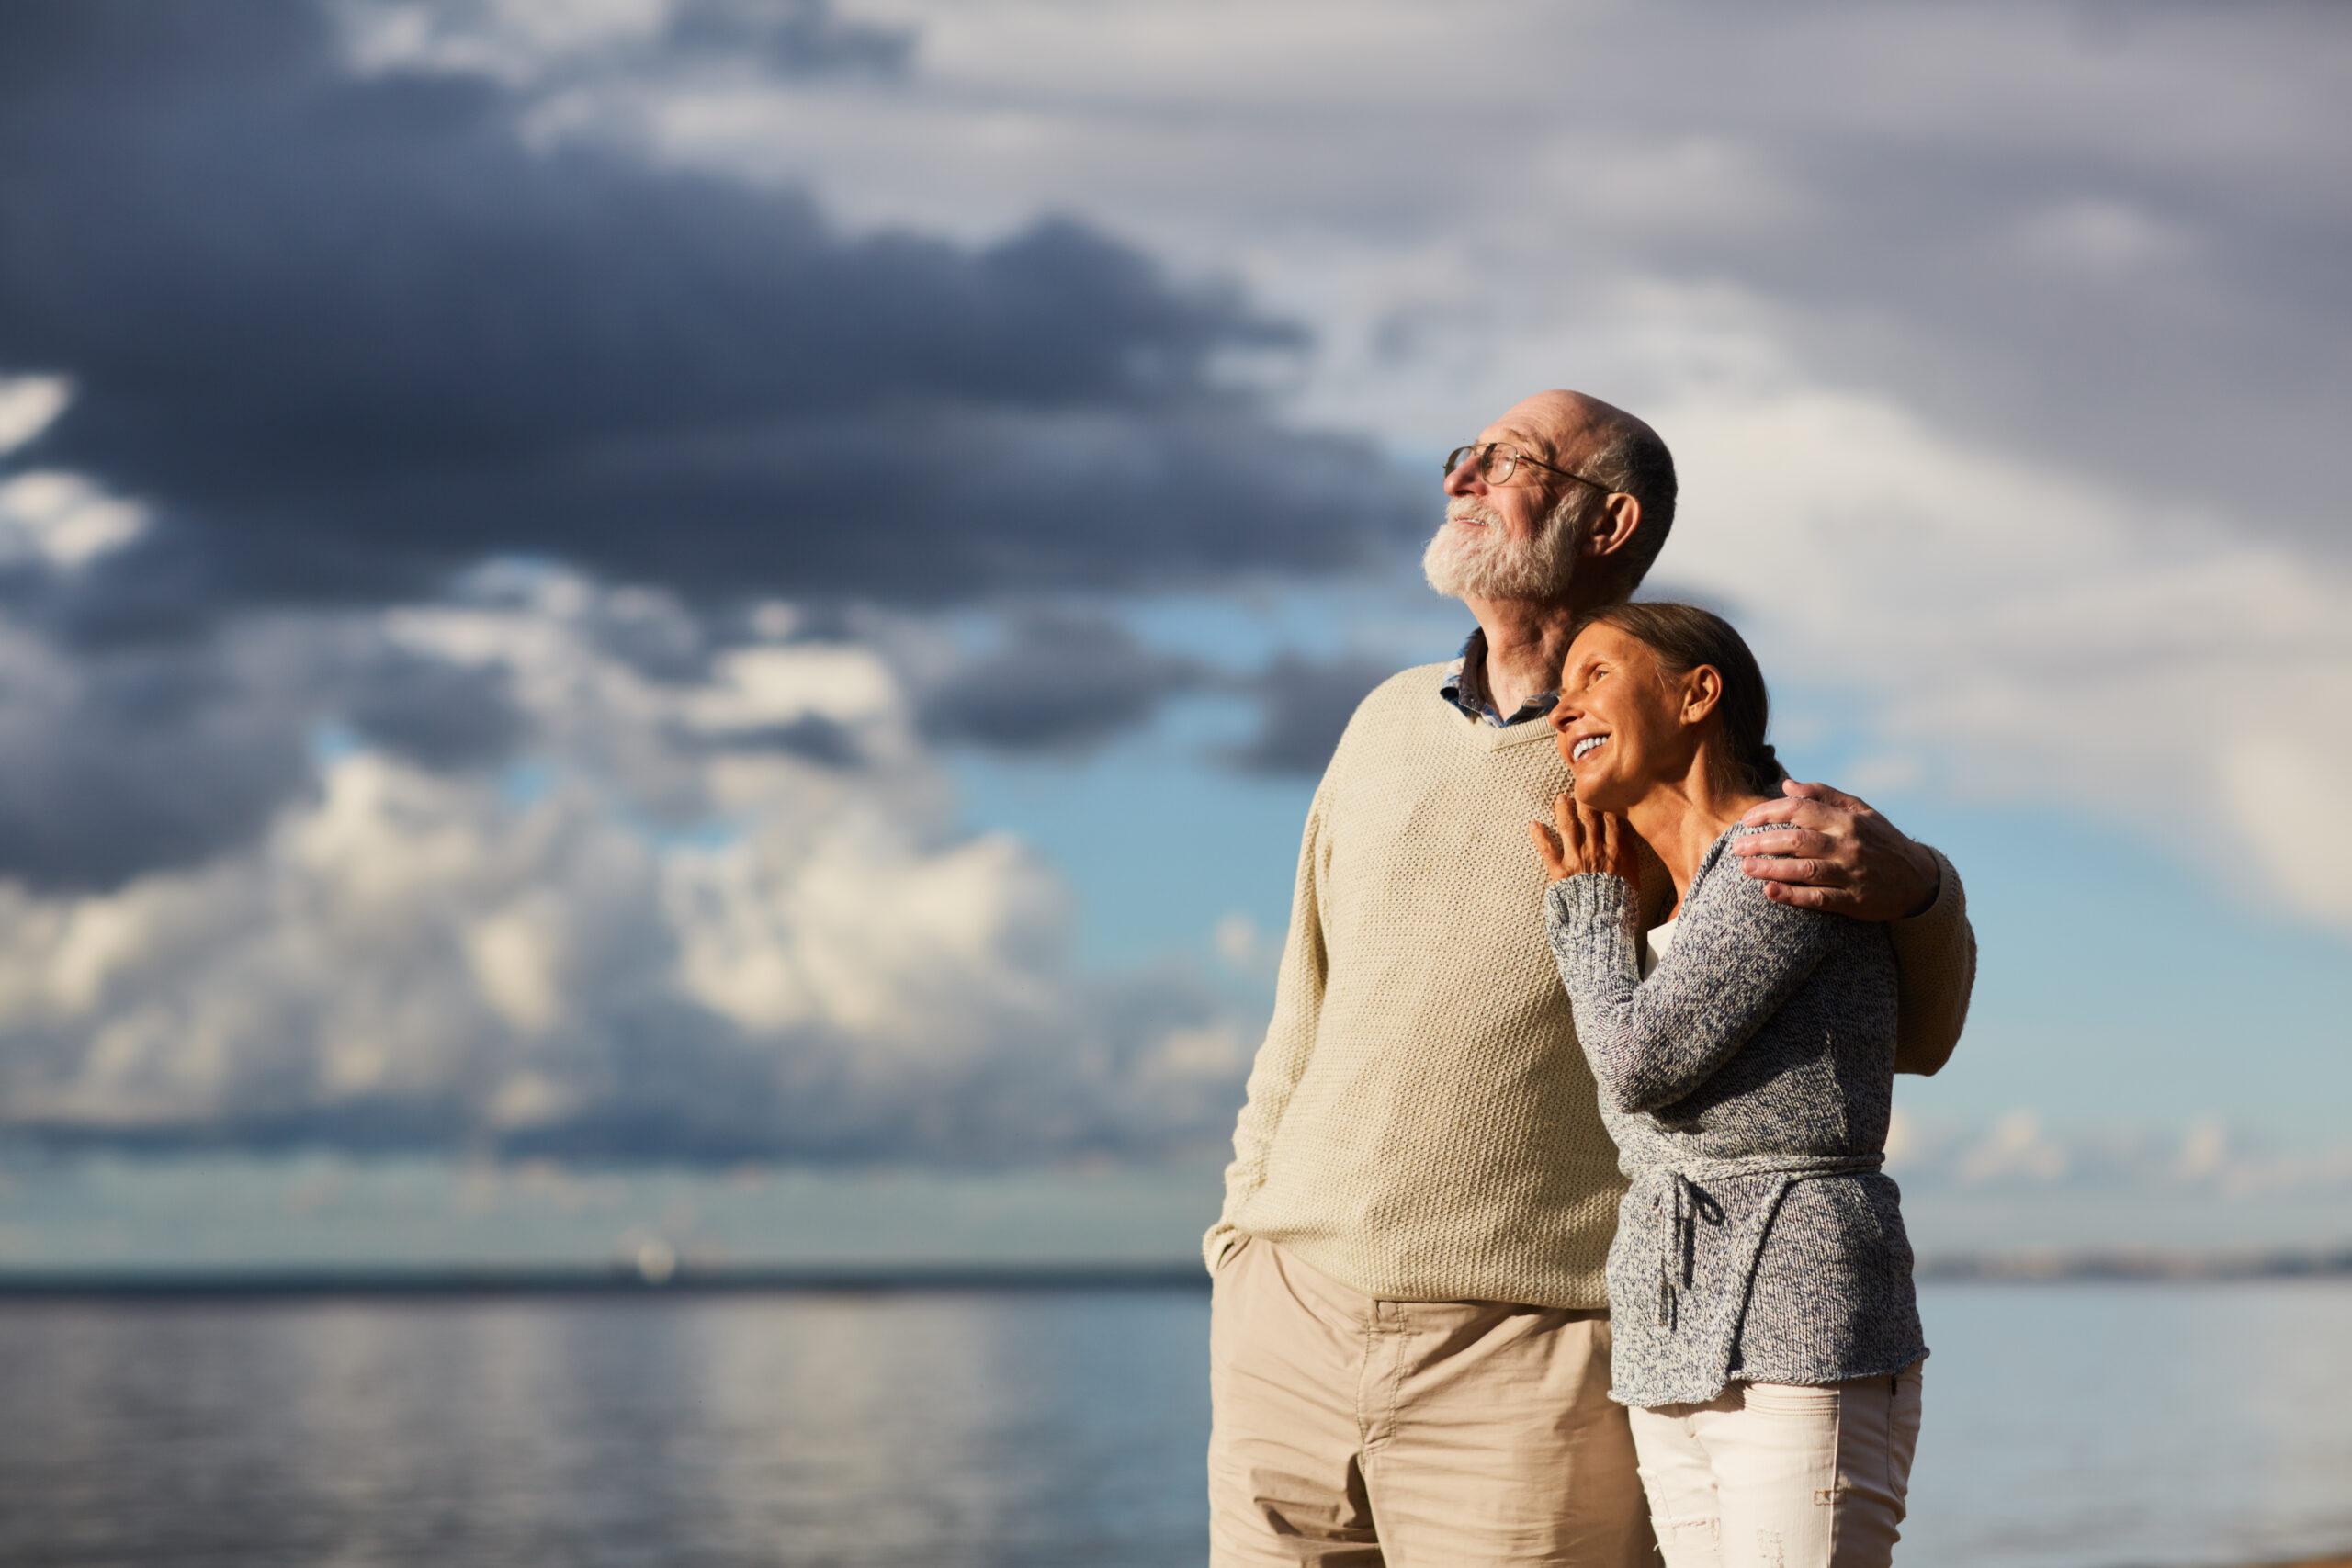 Amorous seniors standing by water against stormy sky and enjoying sundown